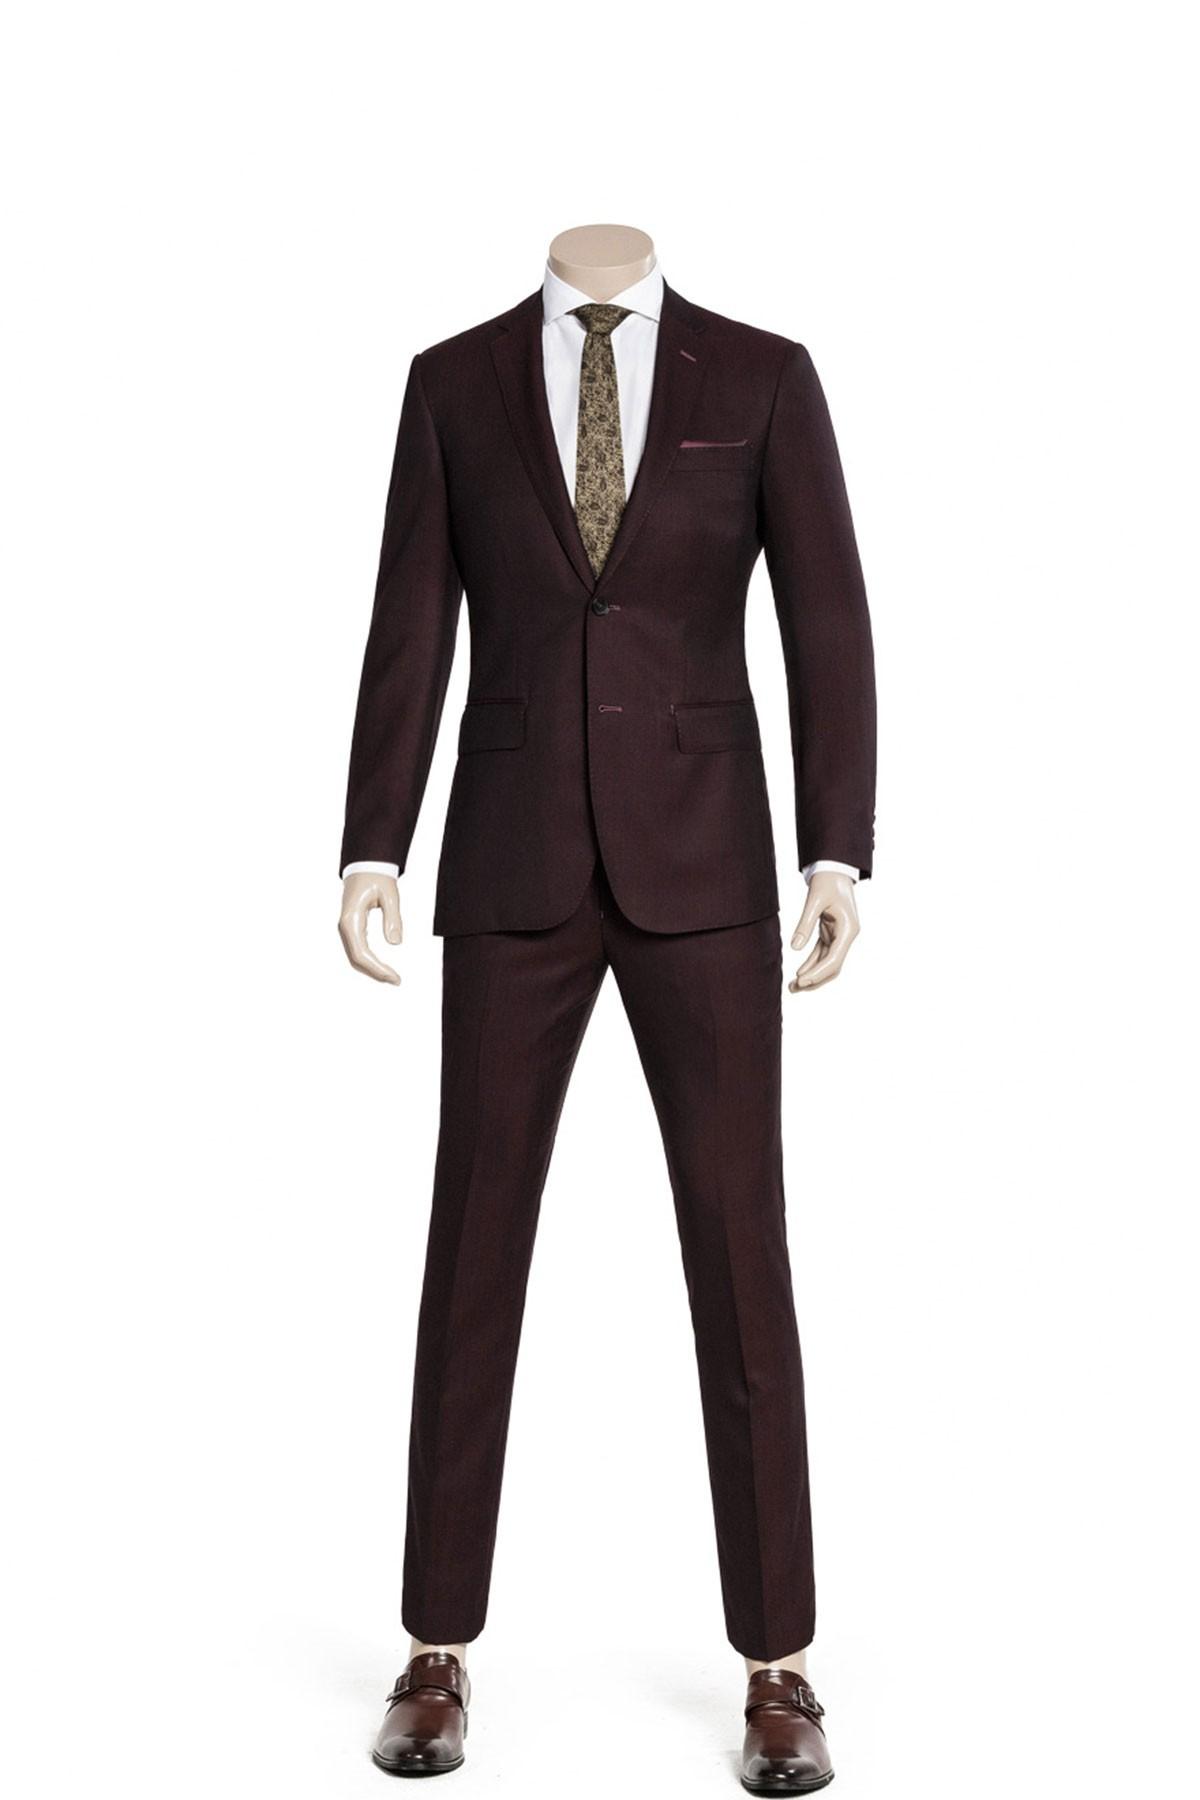 Black-Fiery Red Two-piece Suit ID-983